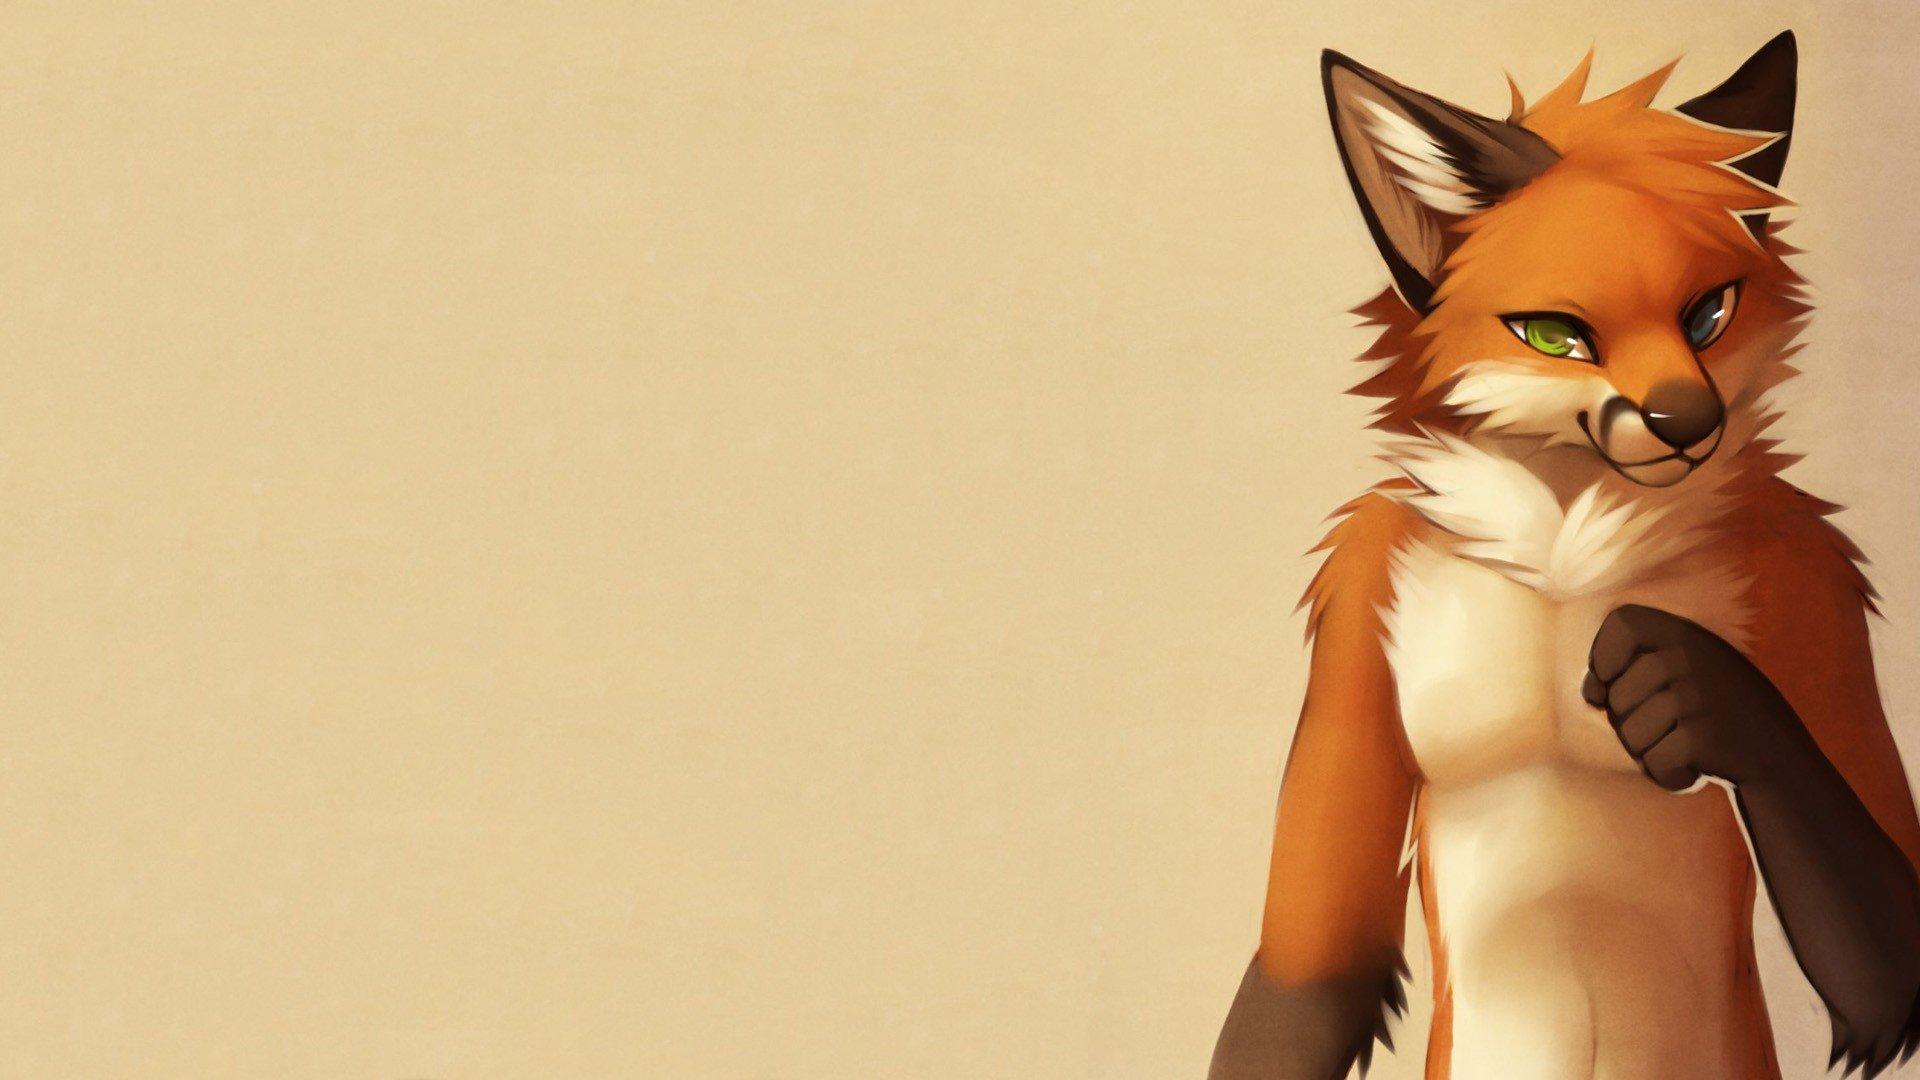 Anthro, Furry Wallpaper